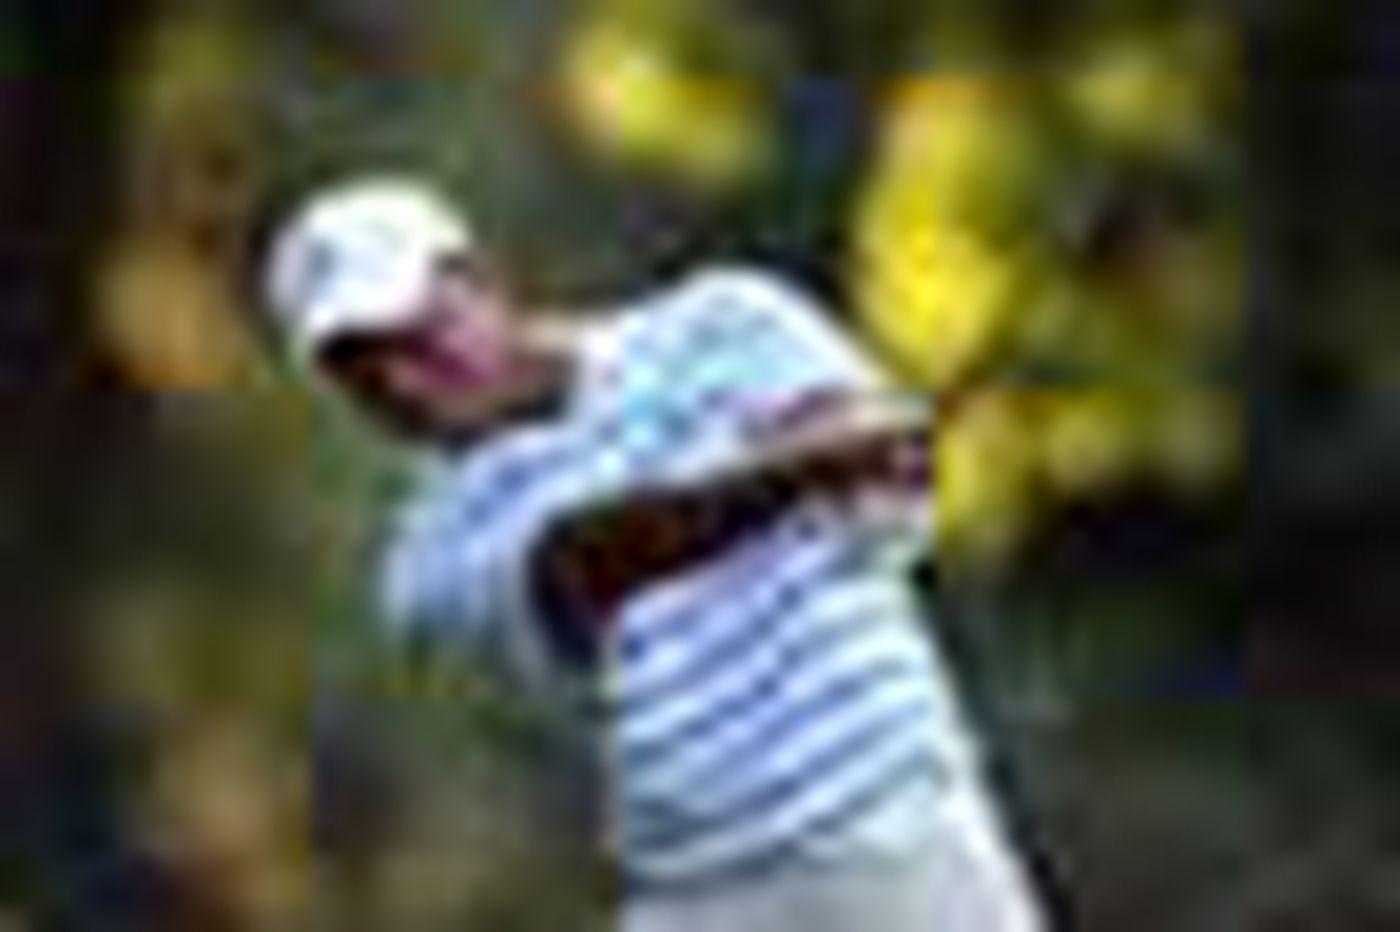 Tiger Woods dazzles them at Aronimink